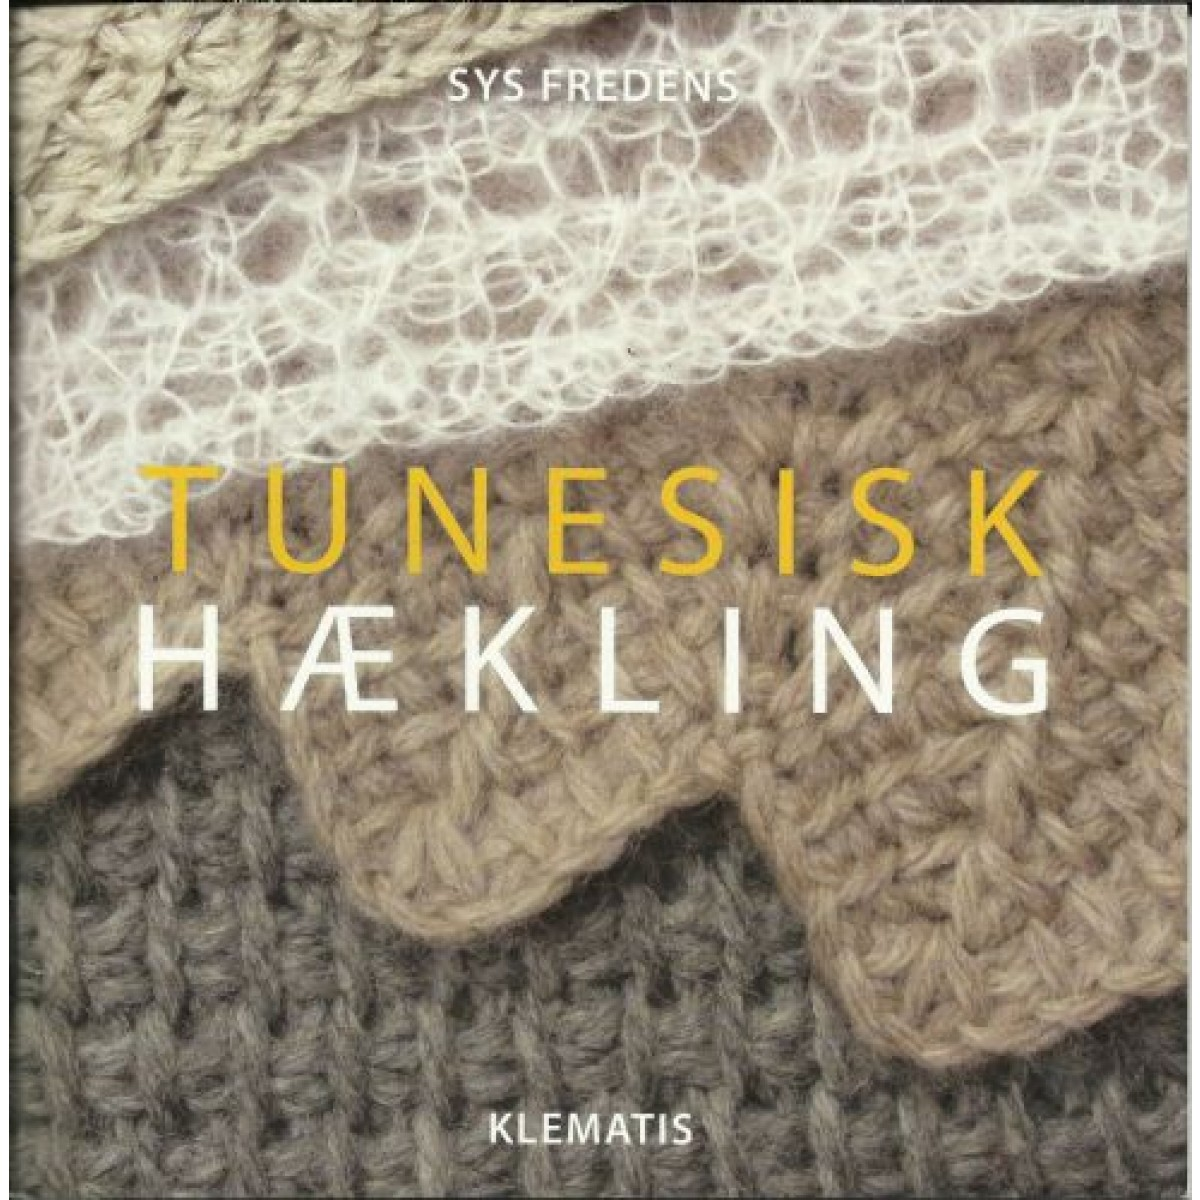 Tunesisk hækling-31